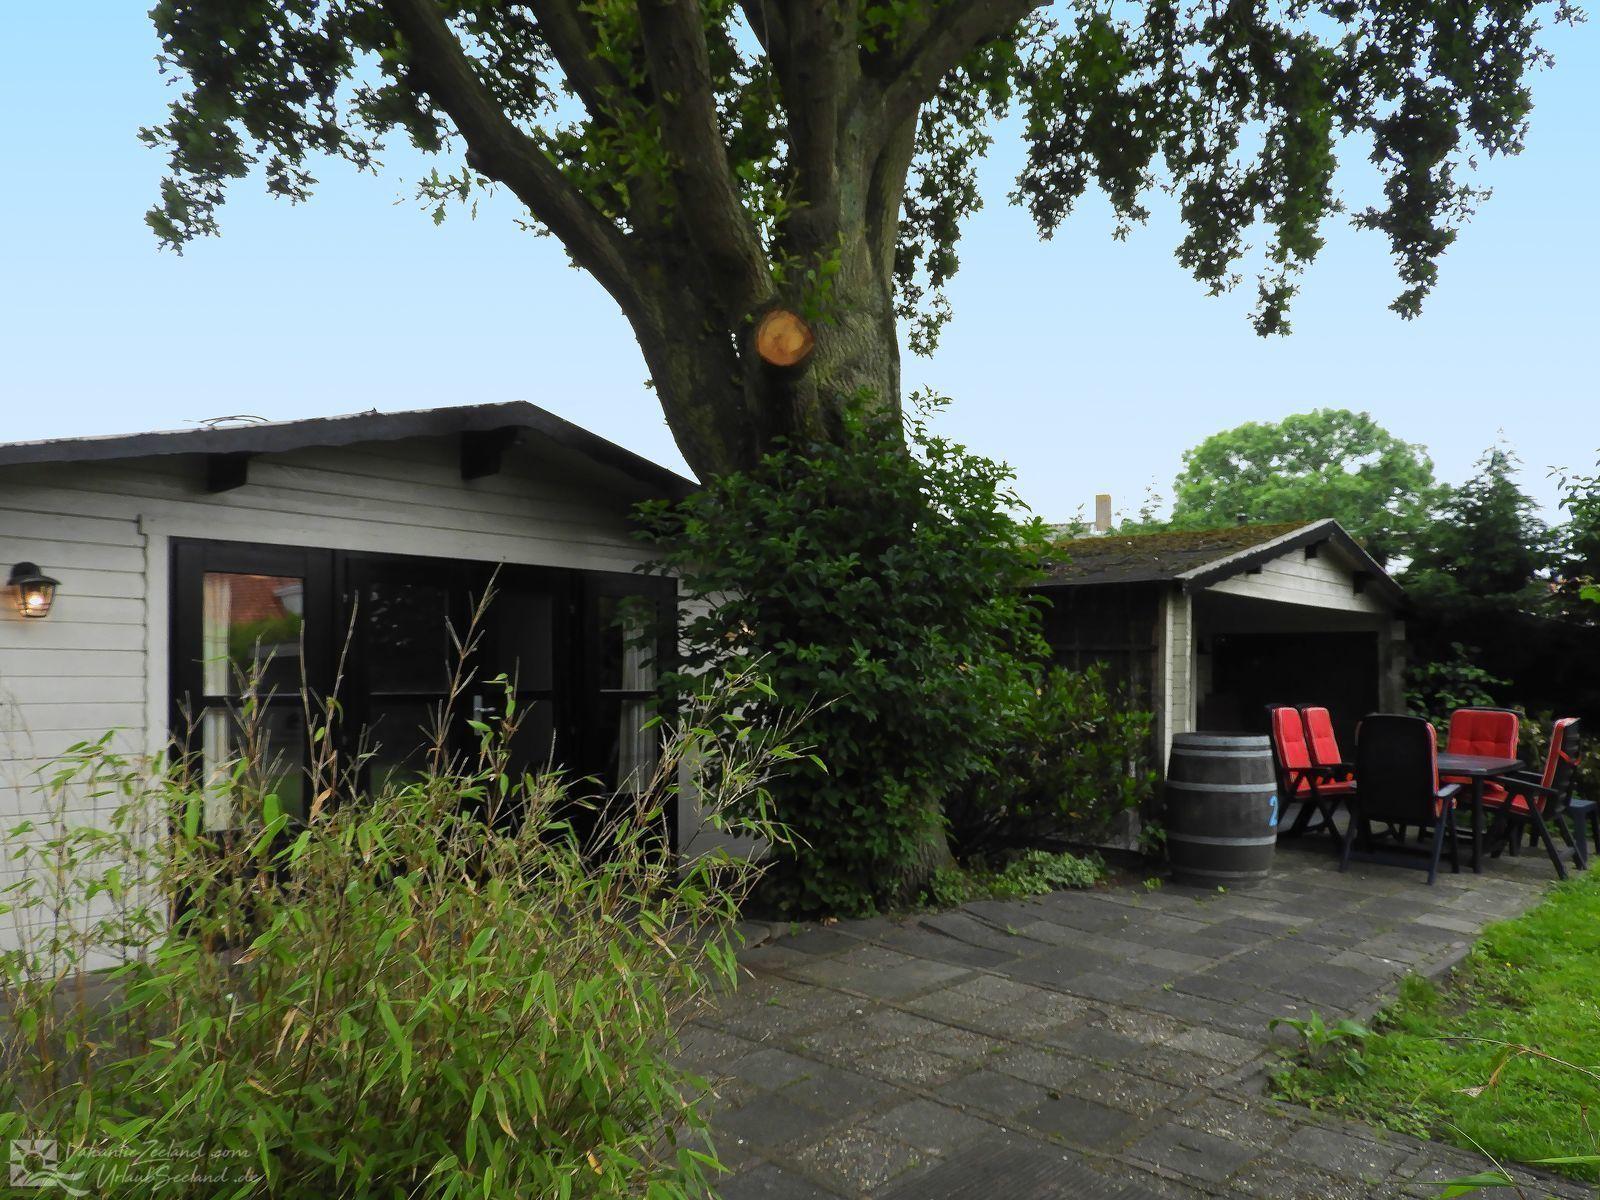 VZ368 Ferienunterkunft Burgh-Haamstede